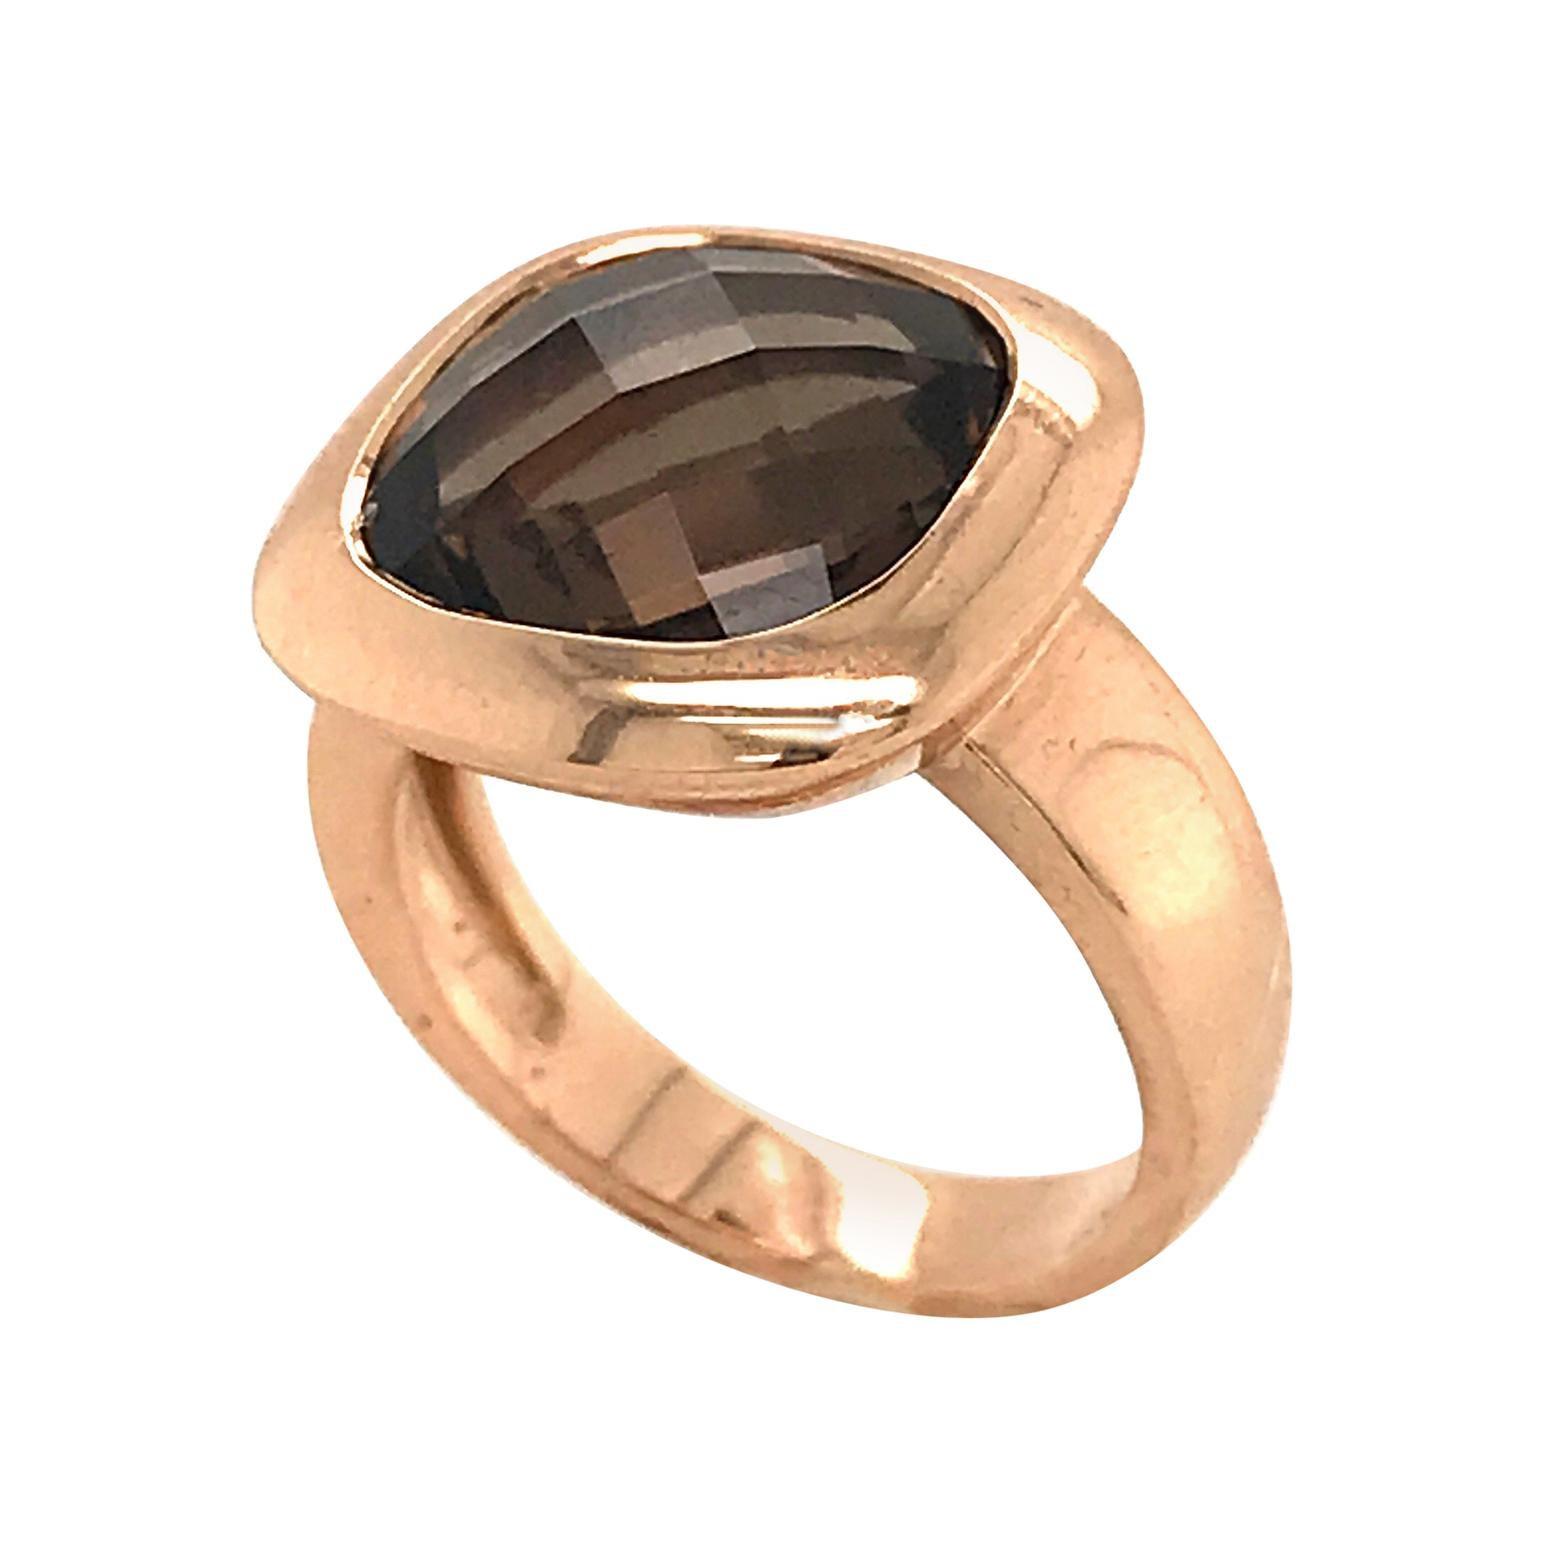 Smoky Quartz Briolette Cut on Rose Gold 18 Karat Fashion Ring